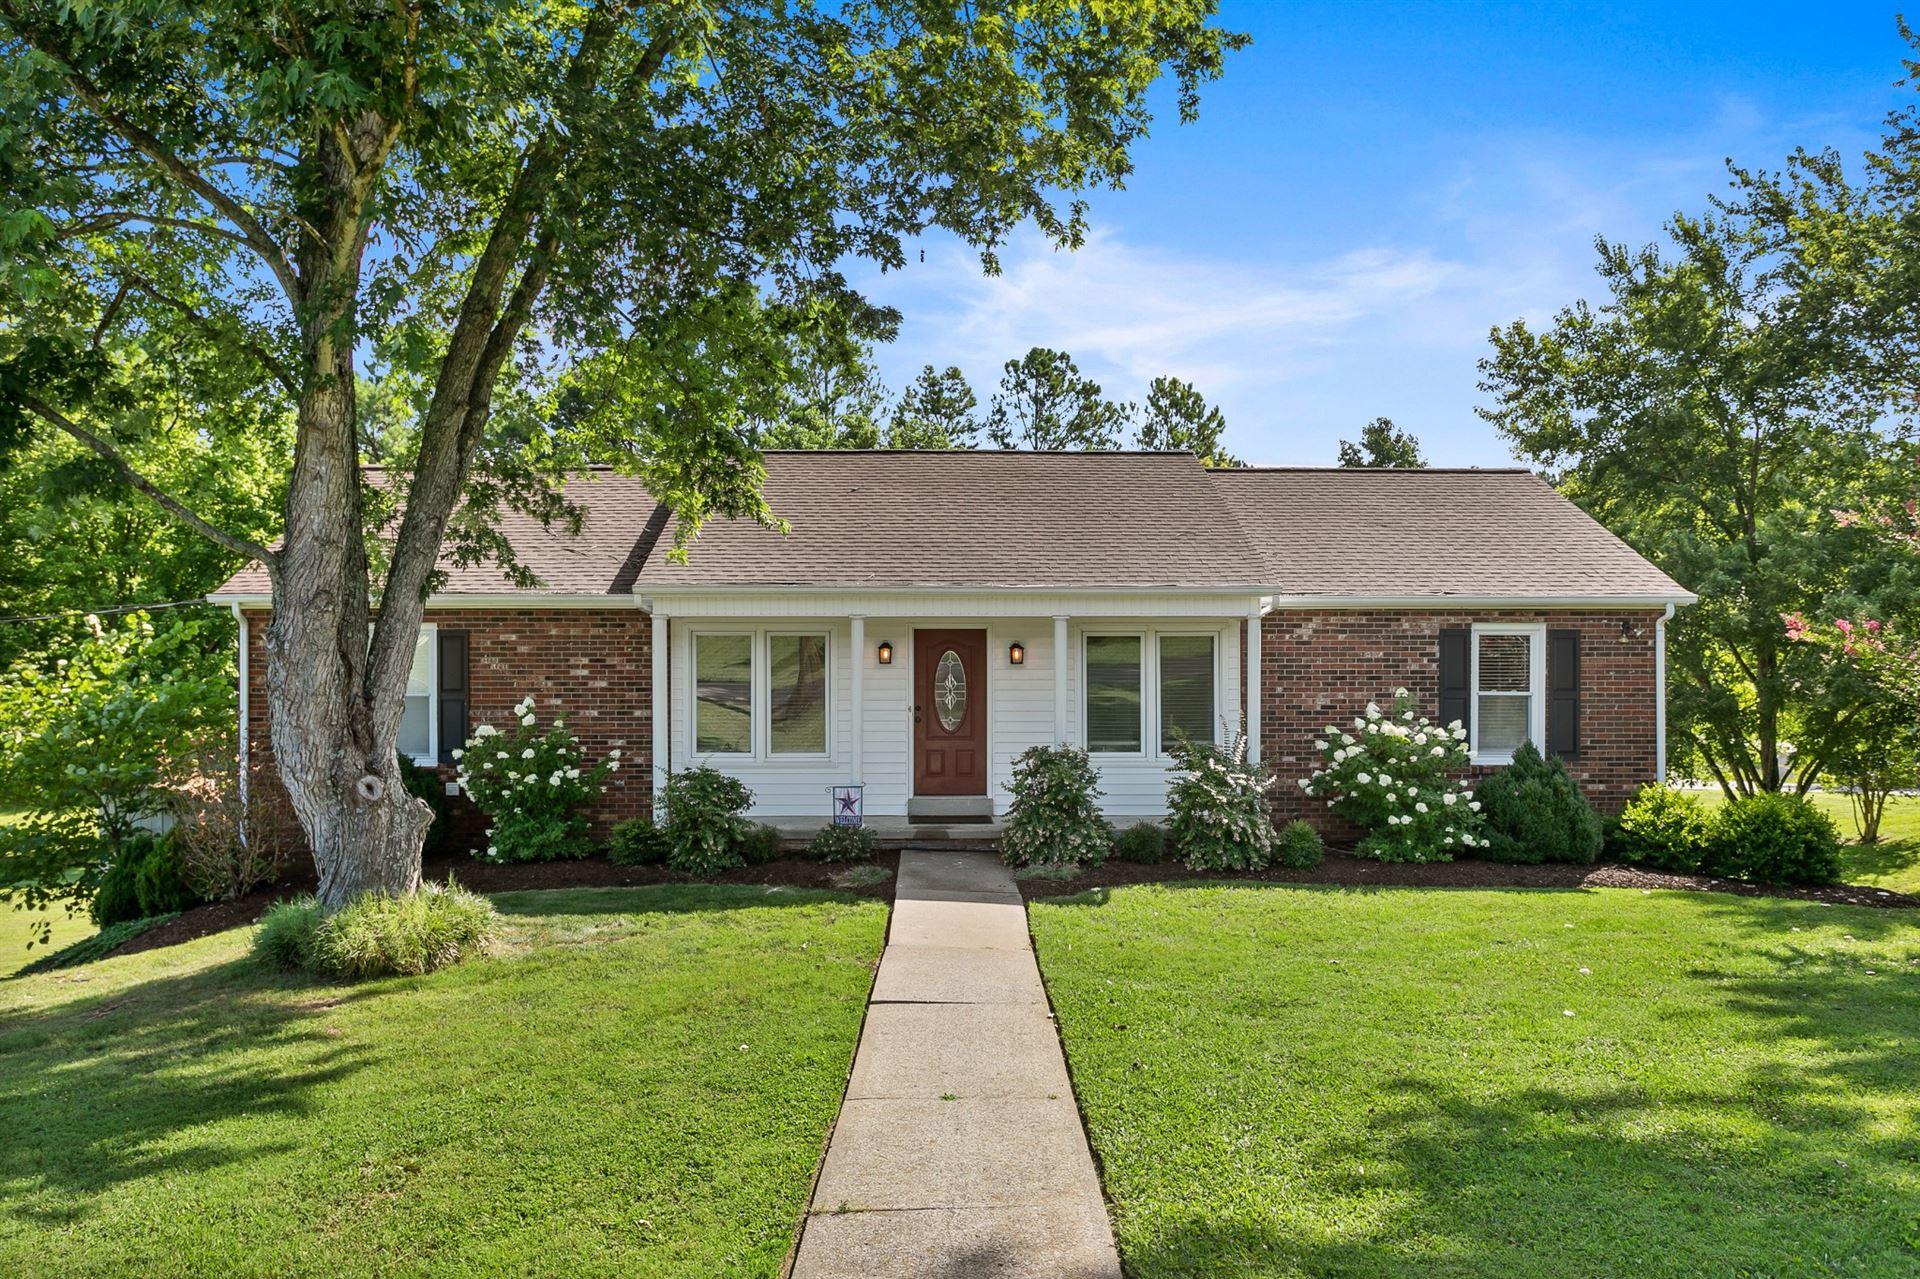 1410 White Dr, Lewisburg, TN 37091 - MLS#: 2275695